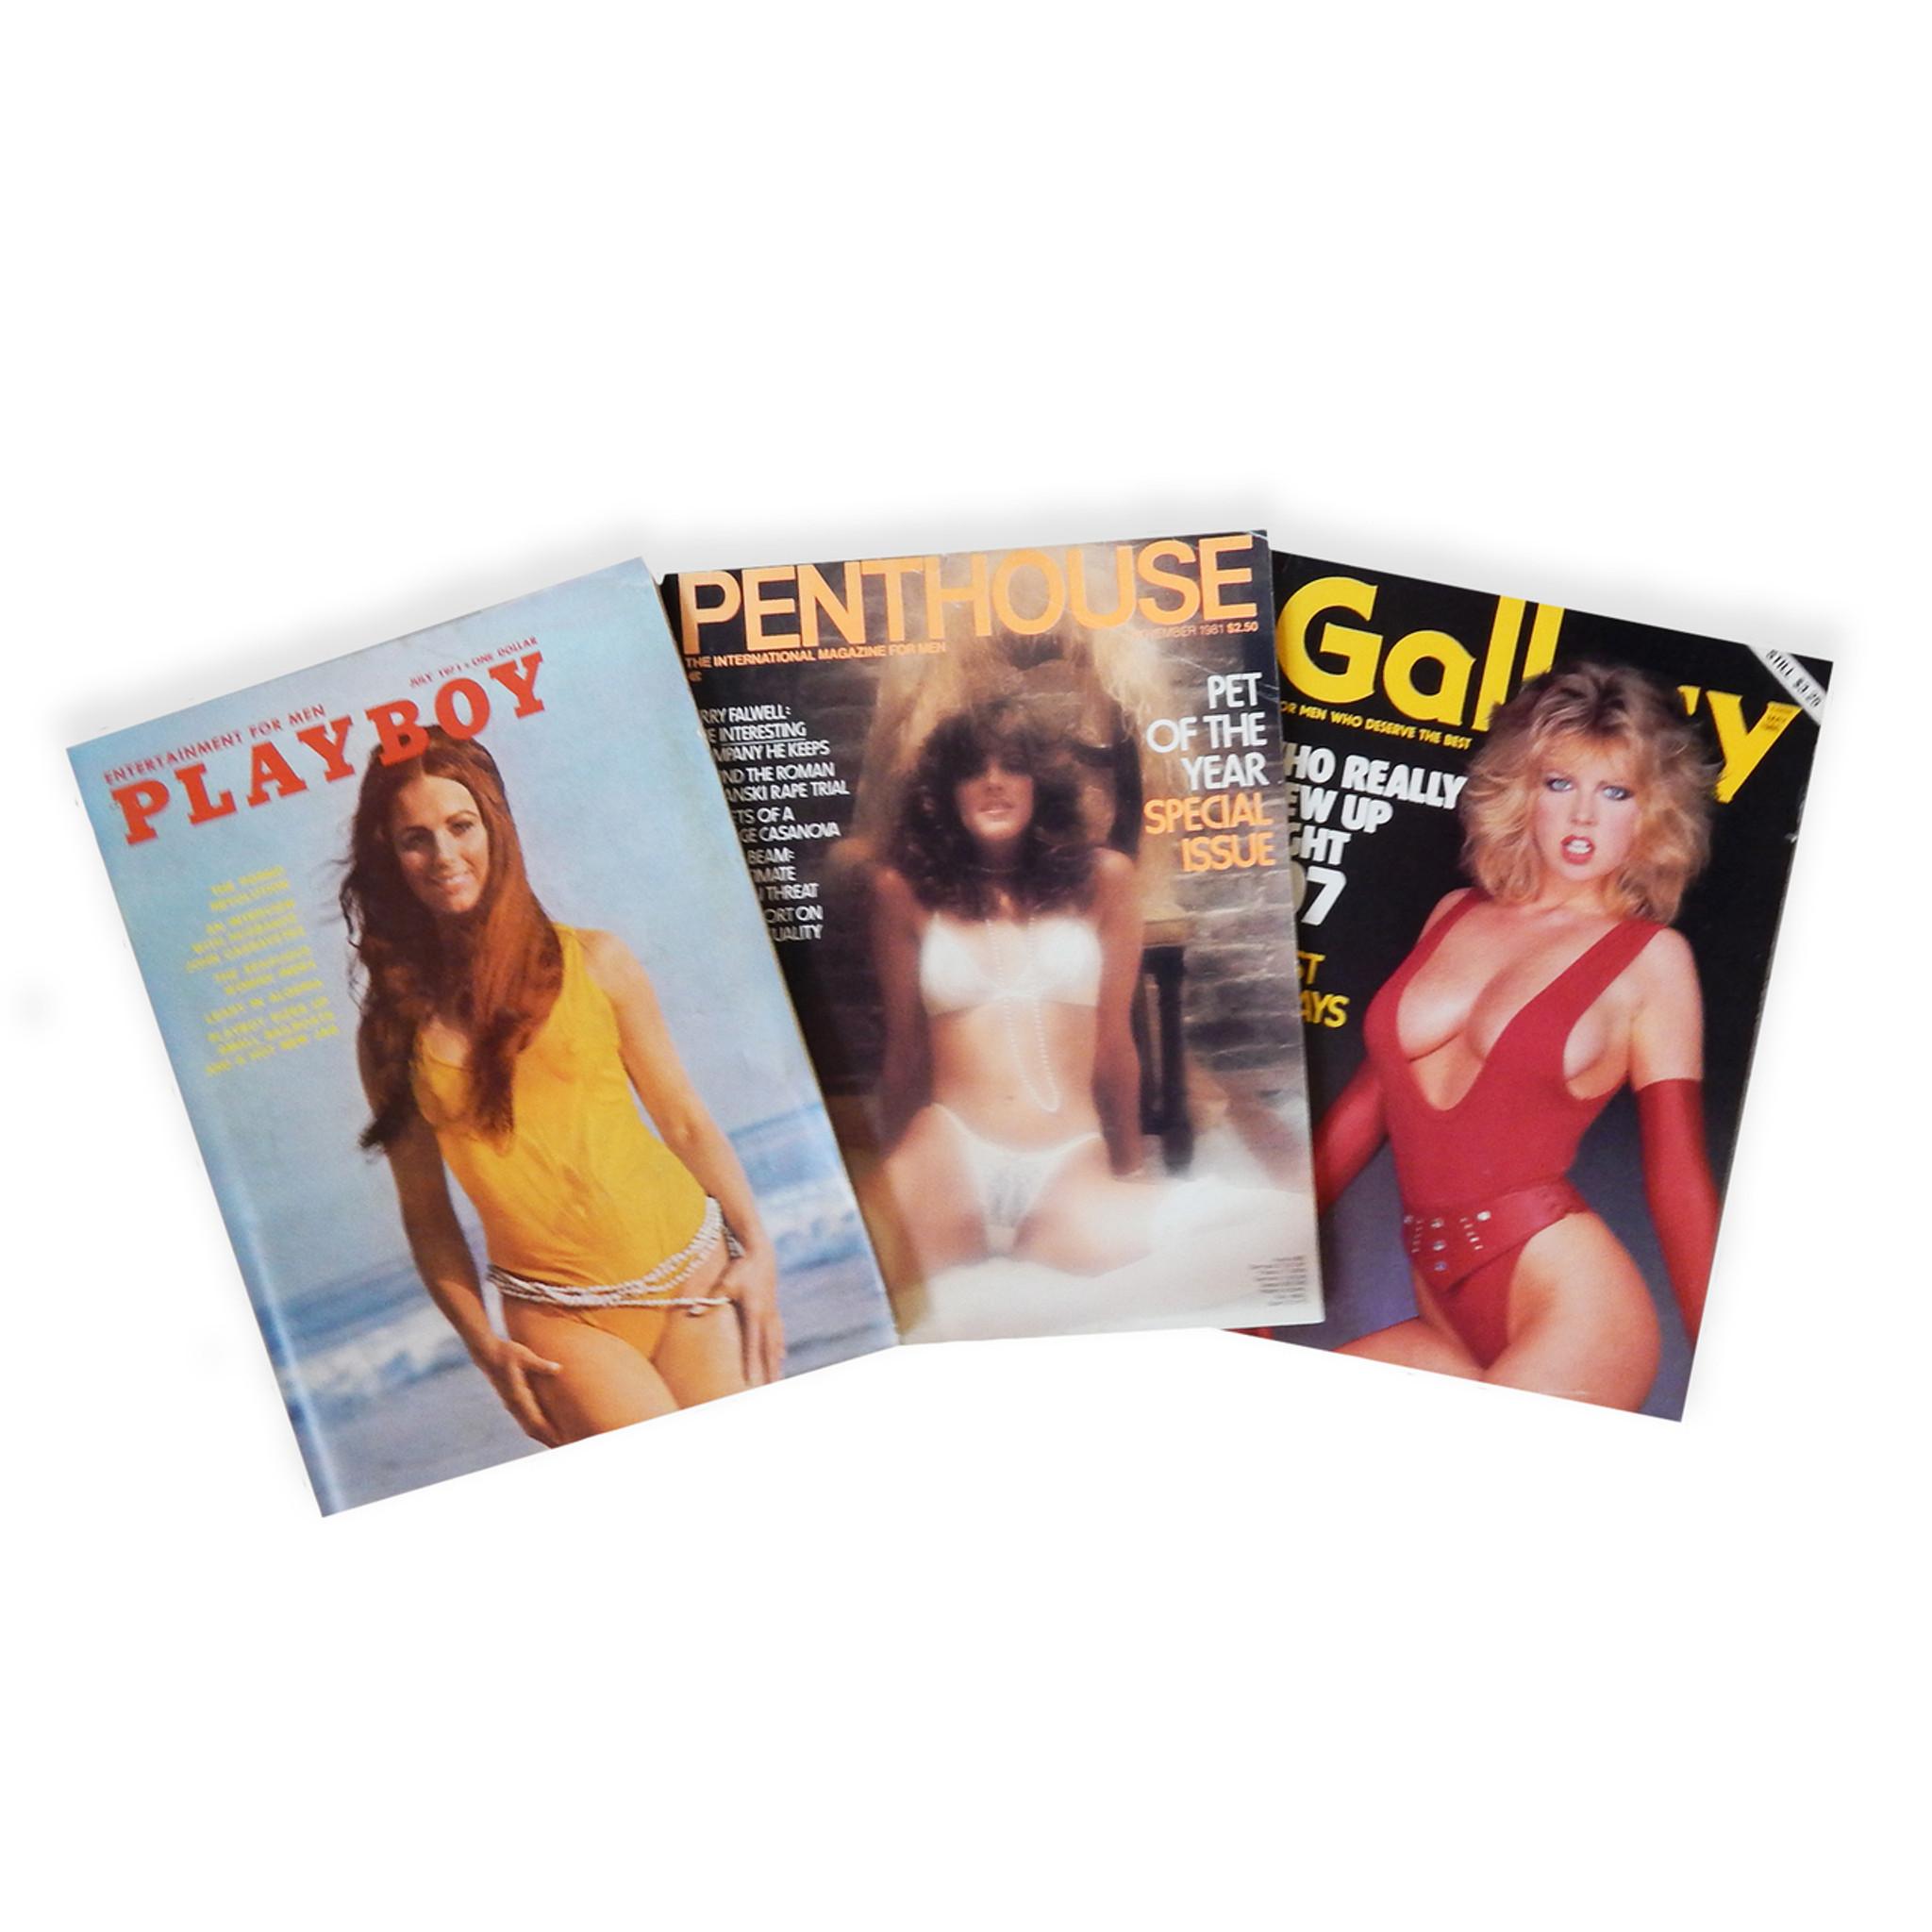 Vintage Porn & Playboy Magazines